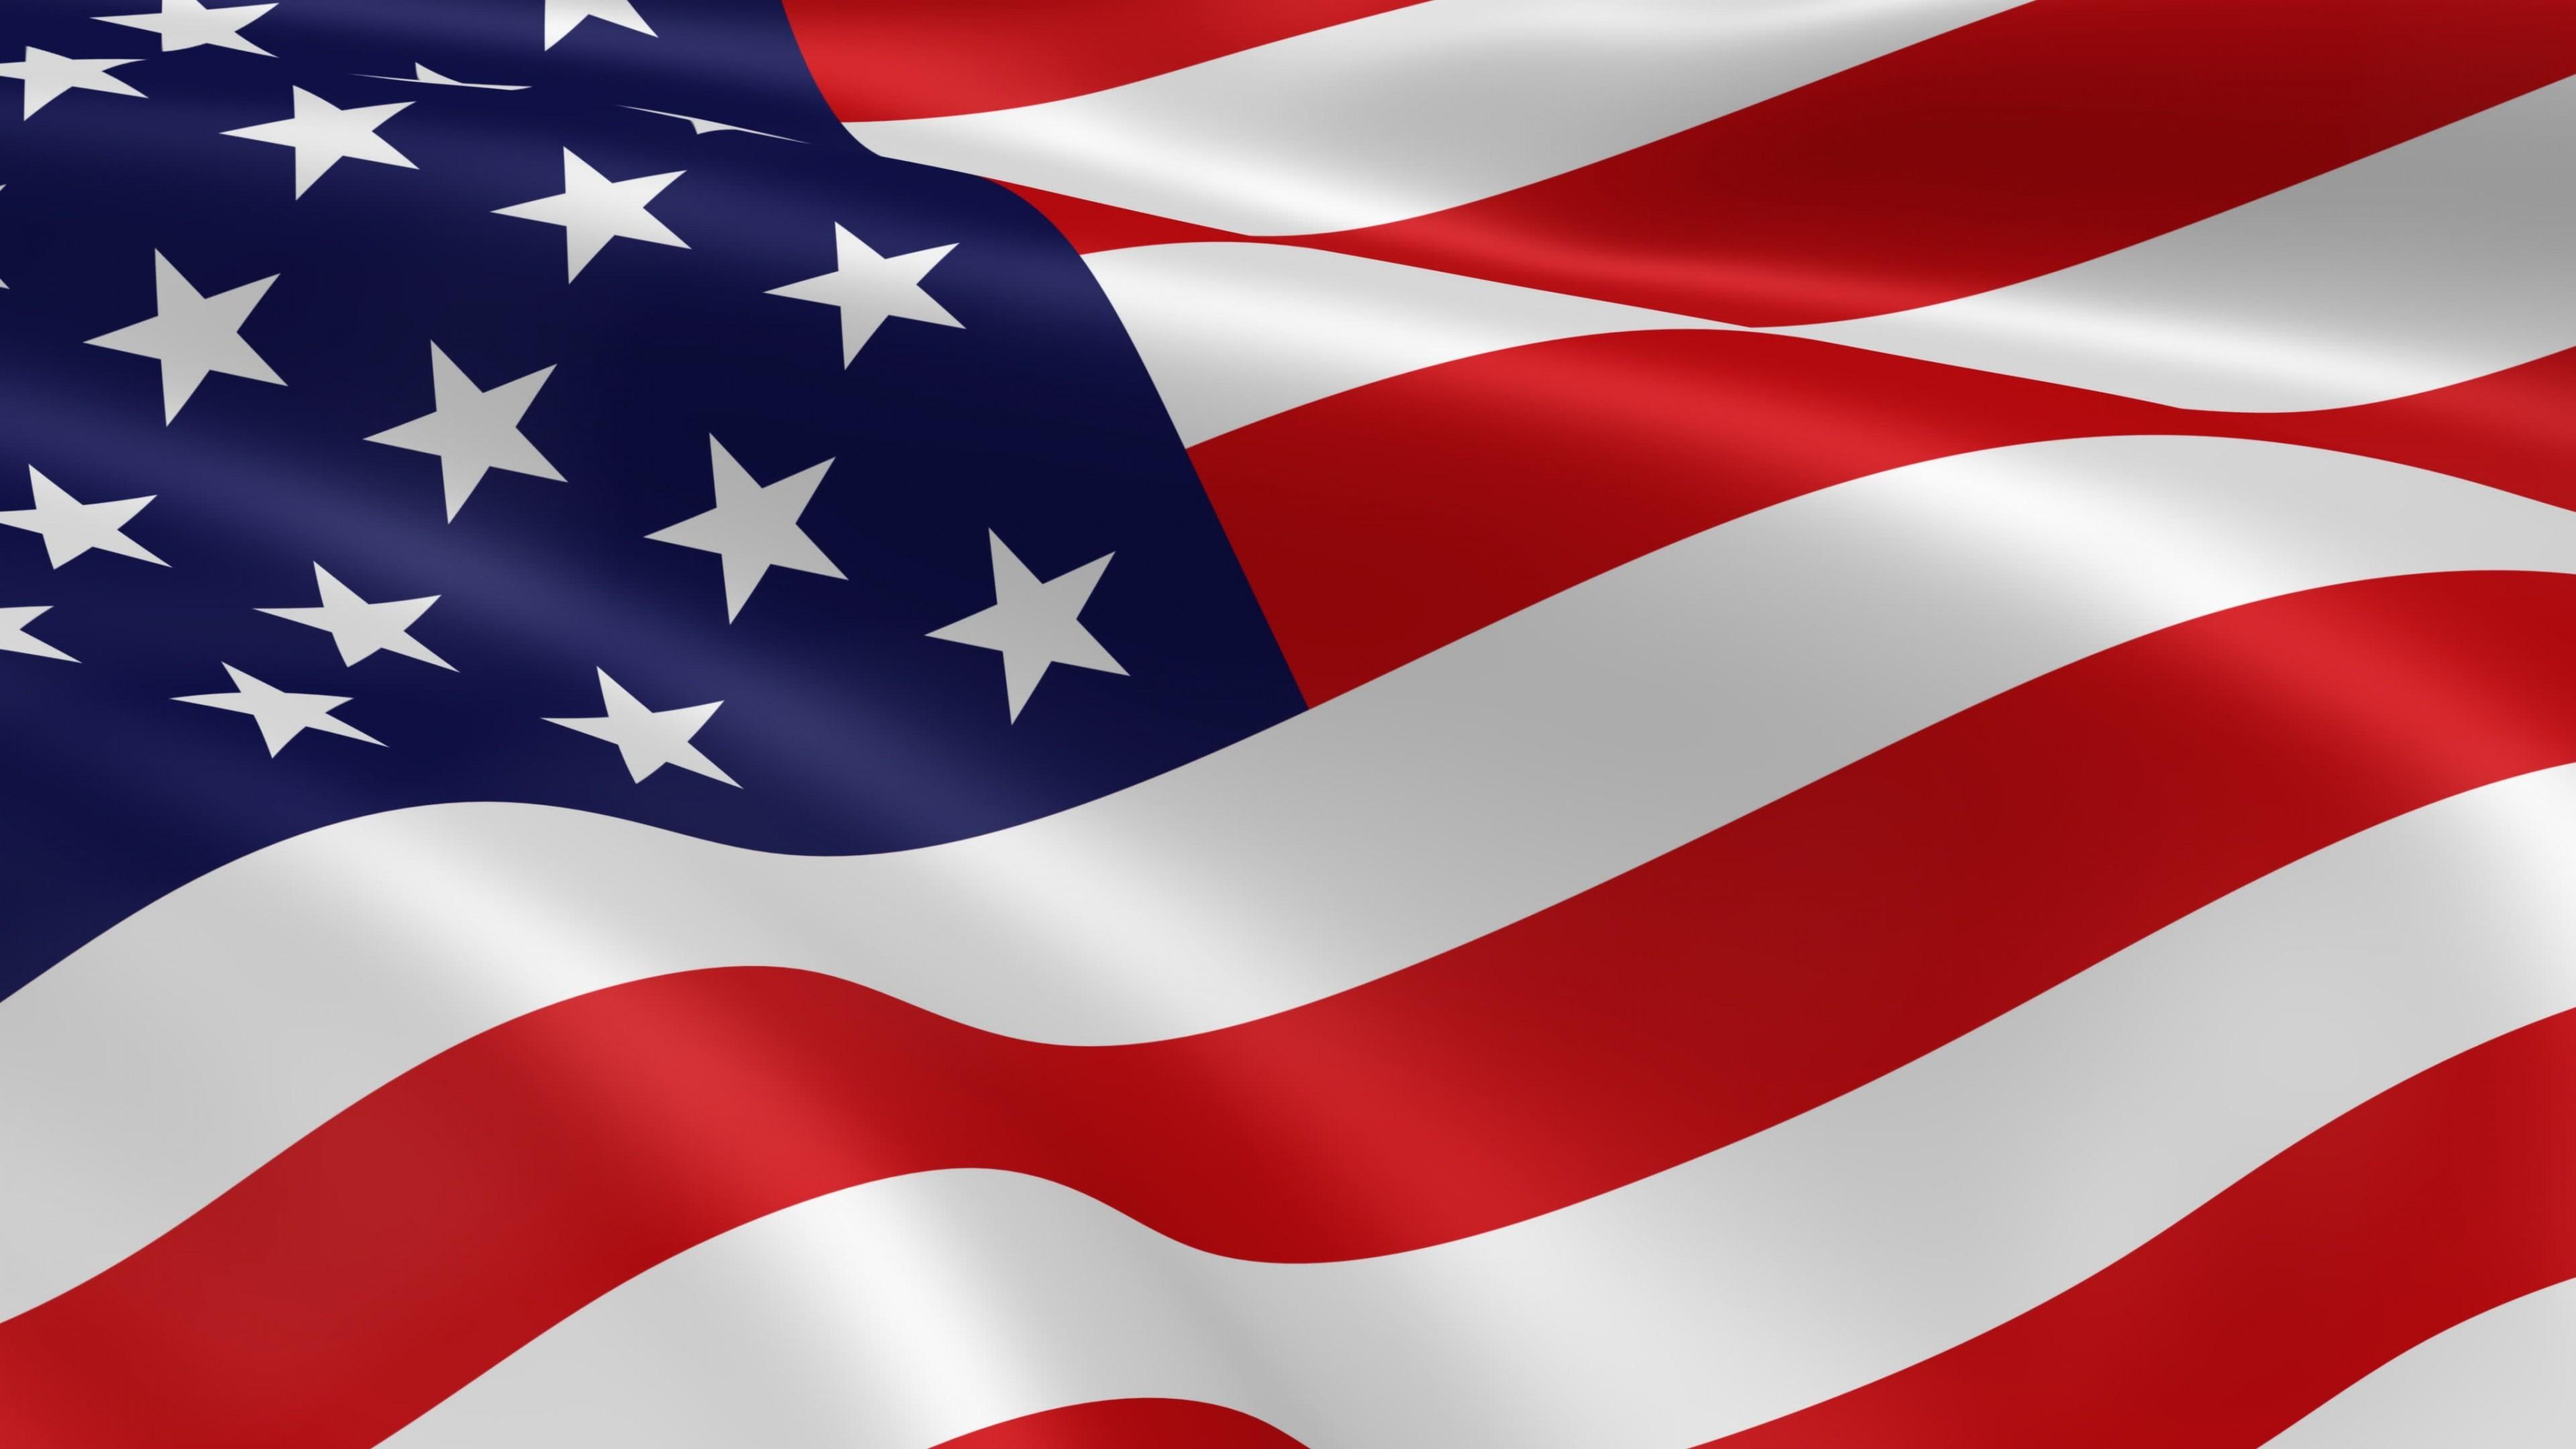 Res: 3840x2160, World / USA Flag Wallpaper